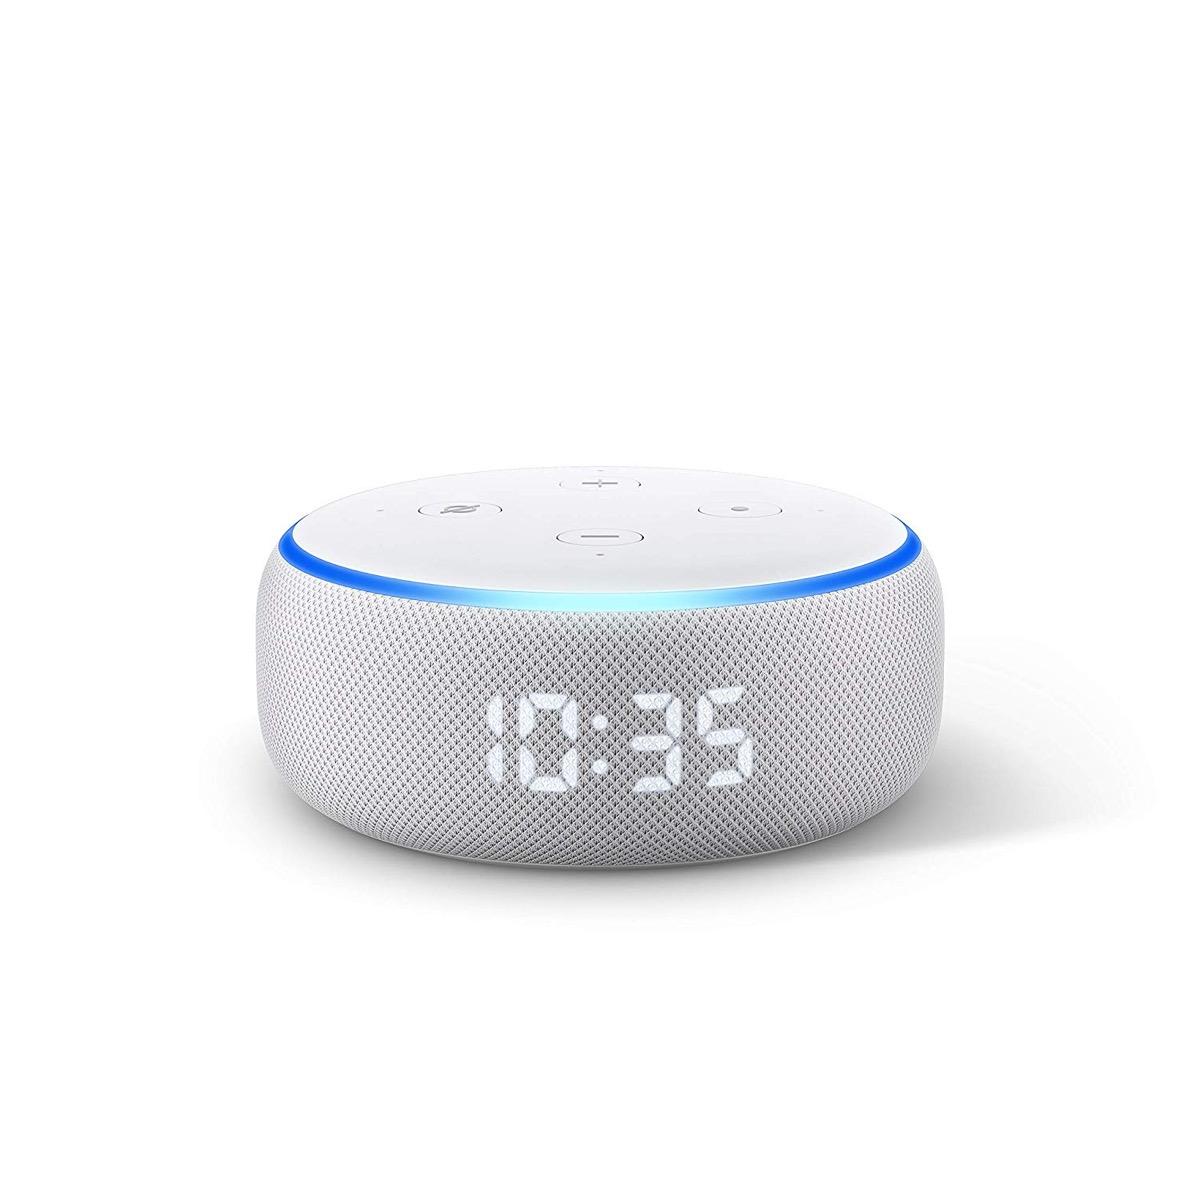 echo dot smart speaker with clock and alexa